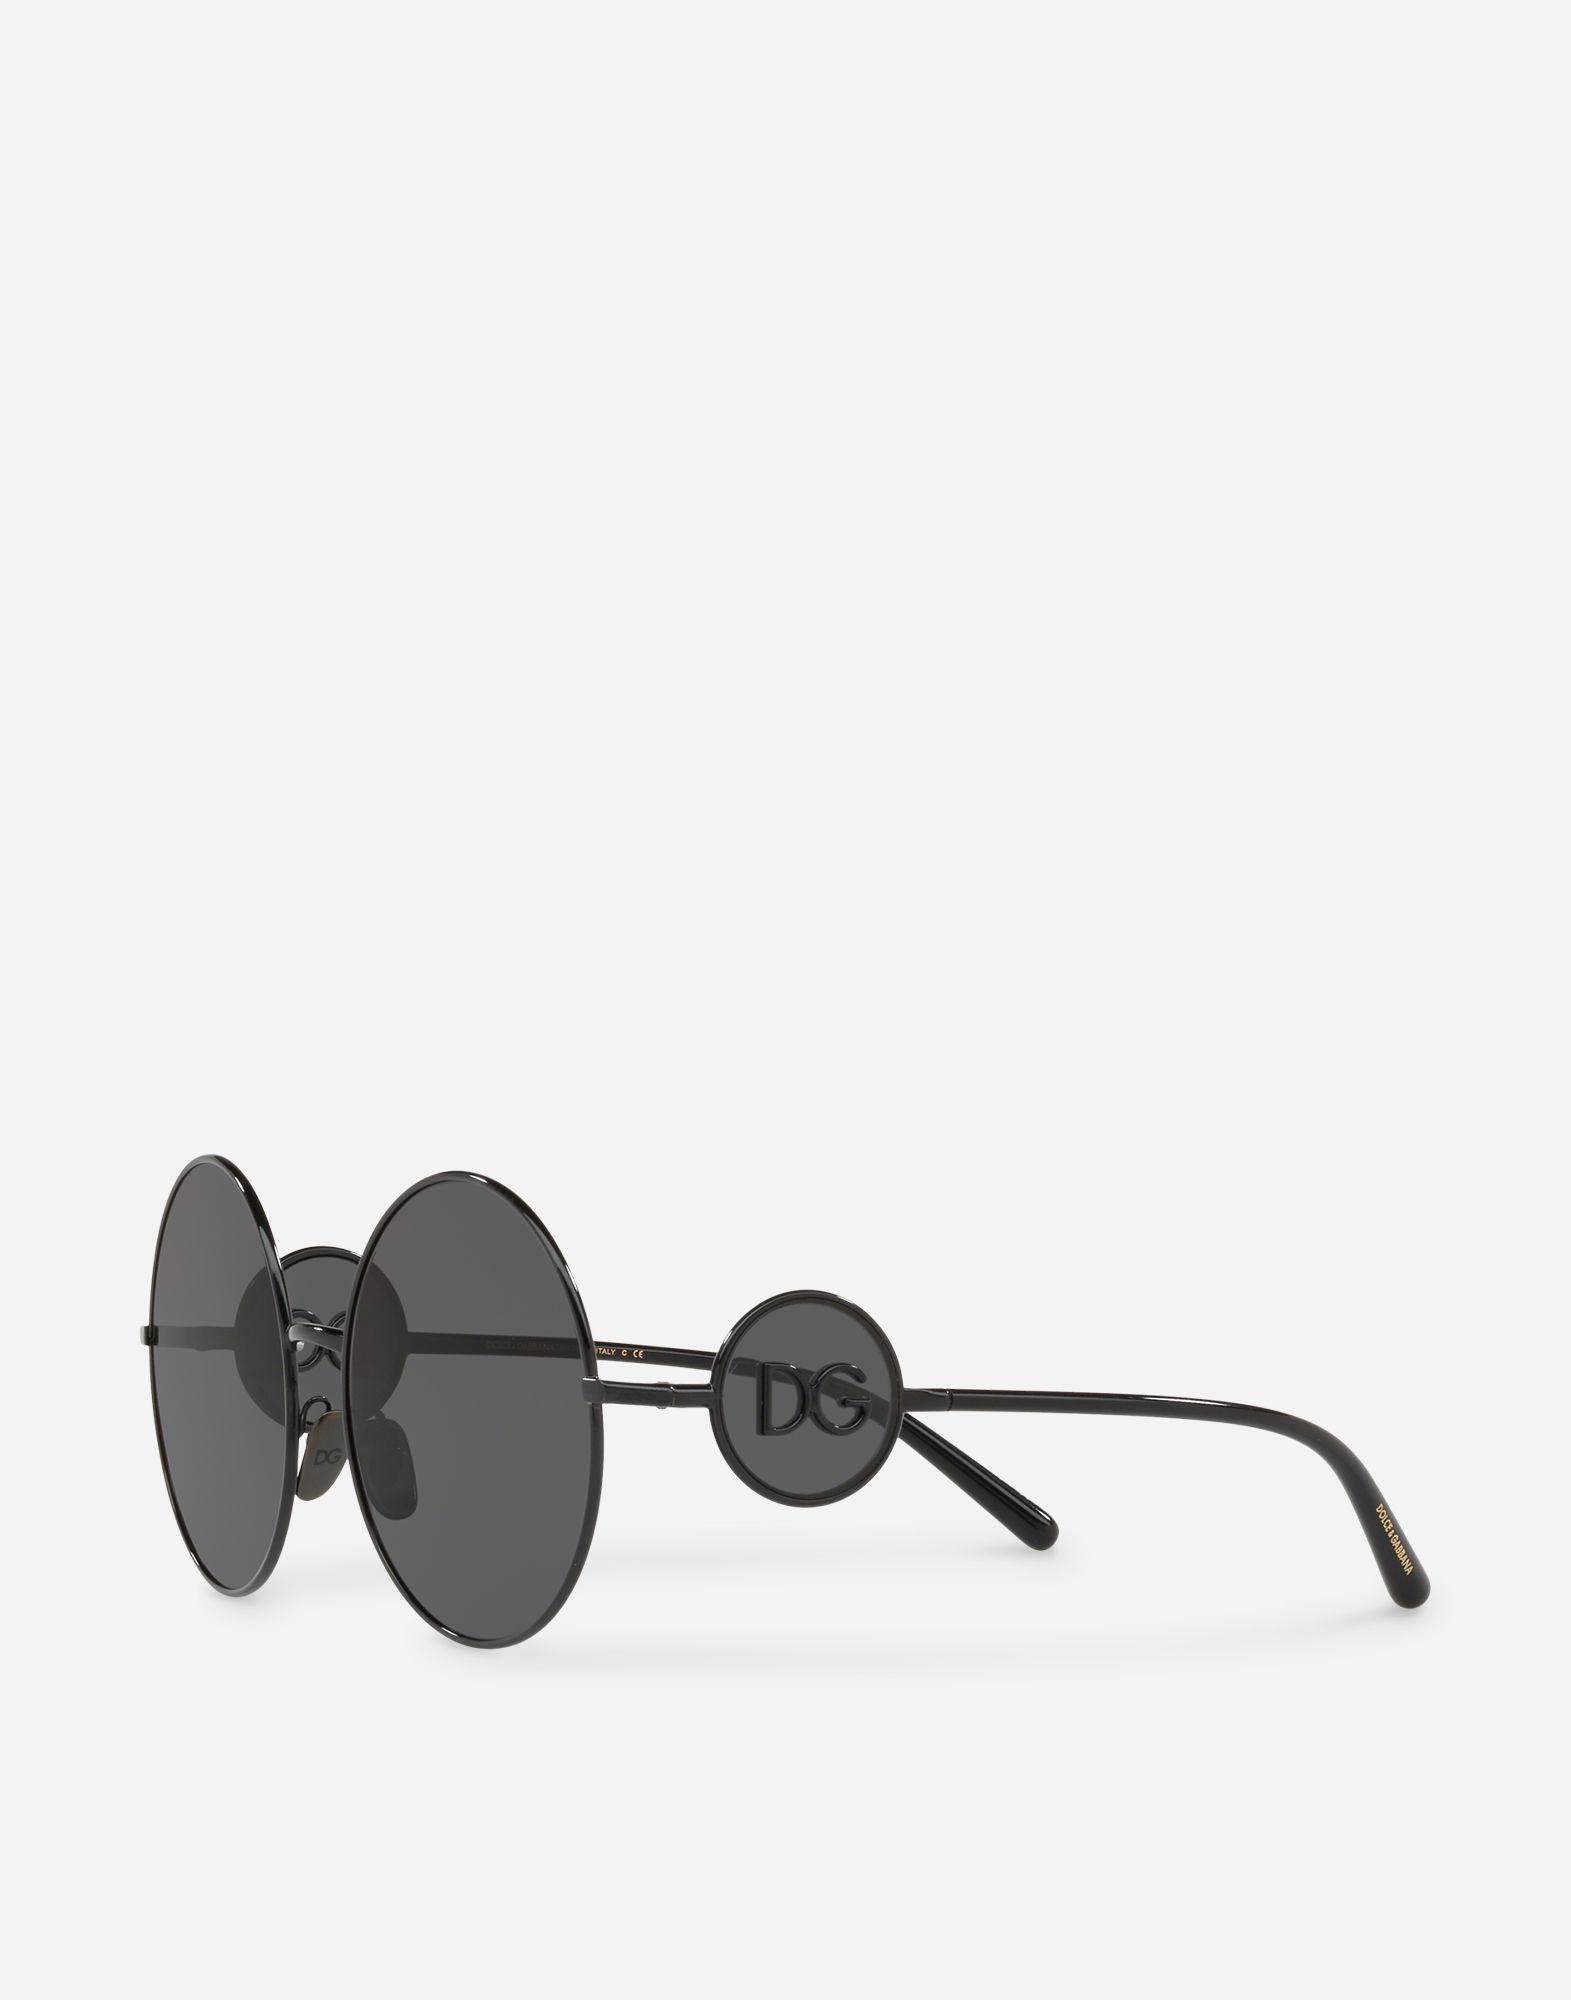 21613b2bf370 Dolce & Gabbana Sicilian Sweet Sunglasses In Black | ModeSens